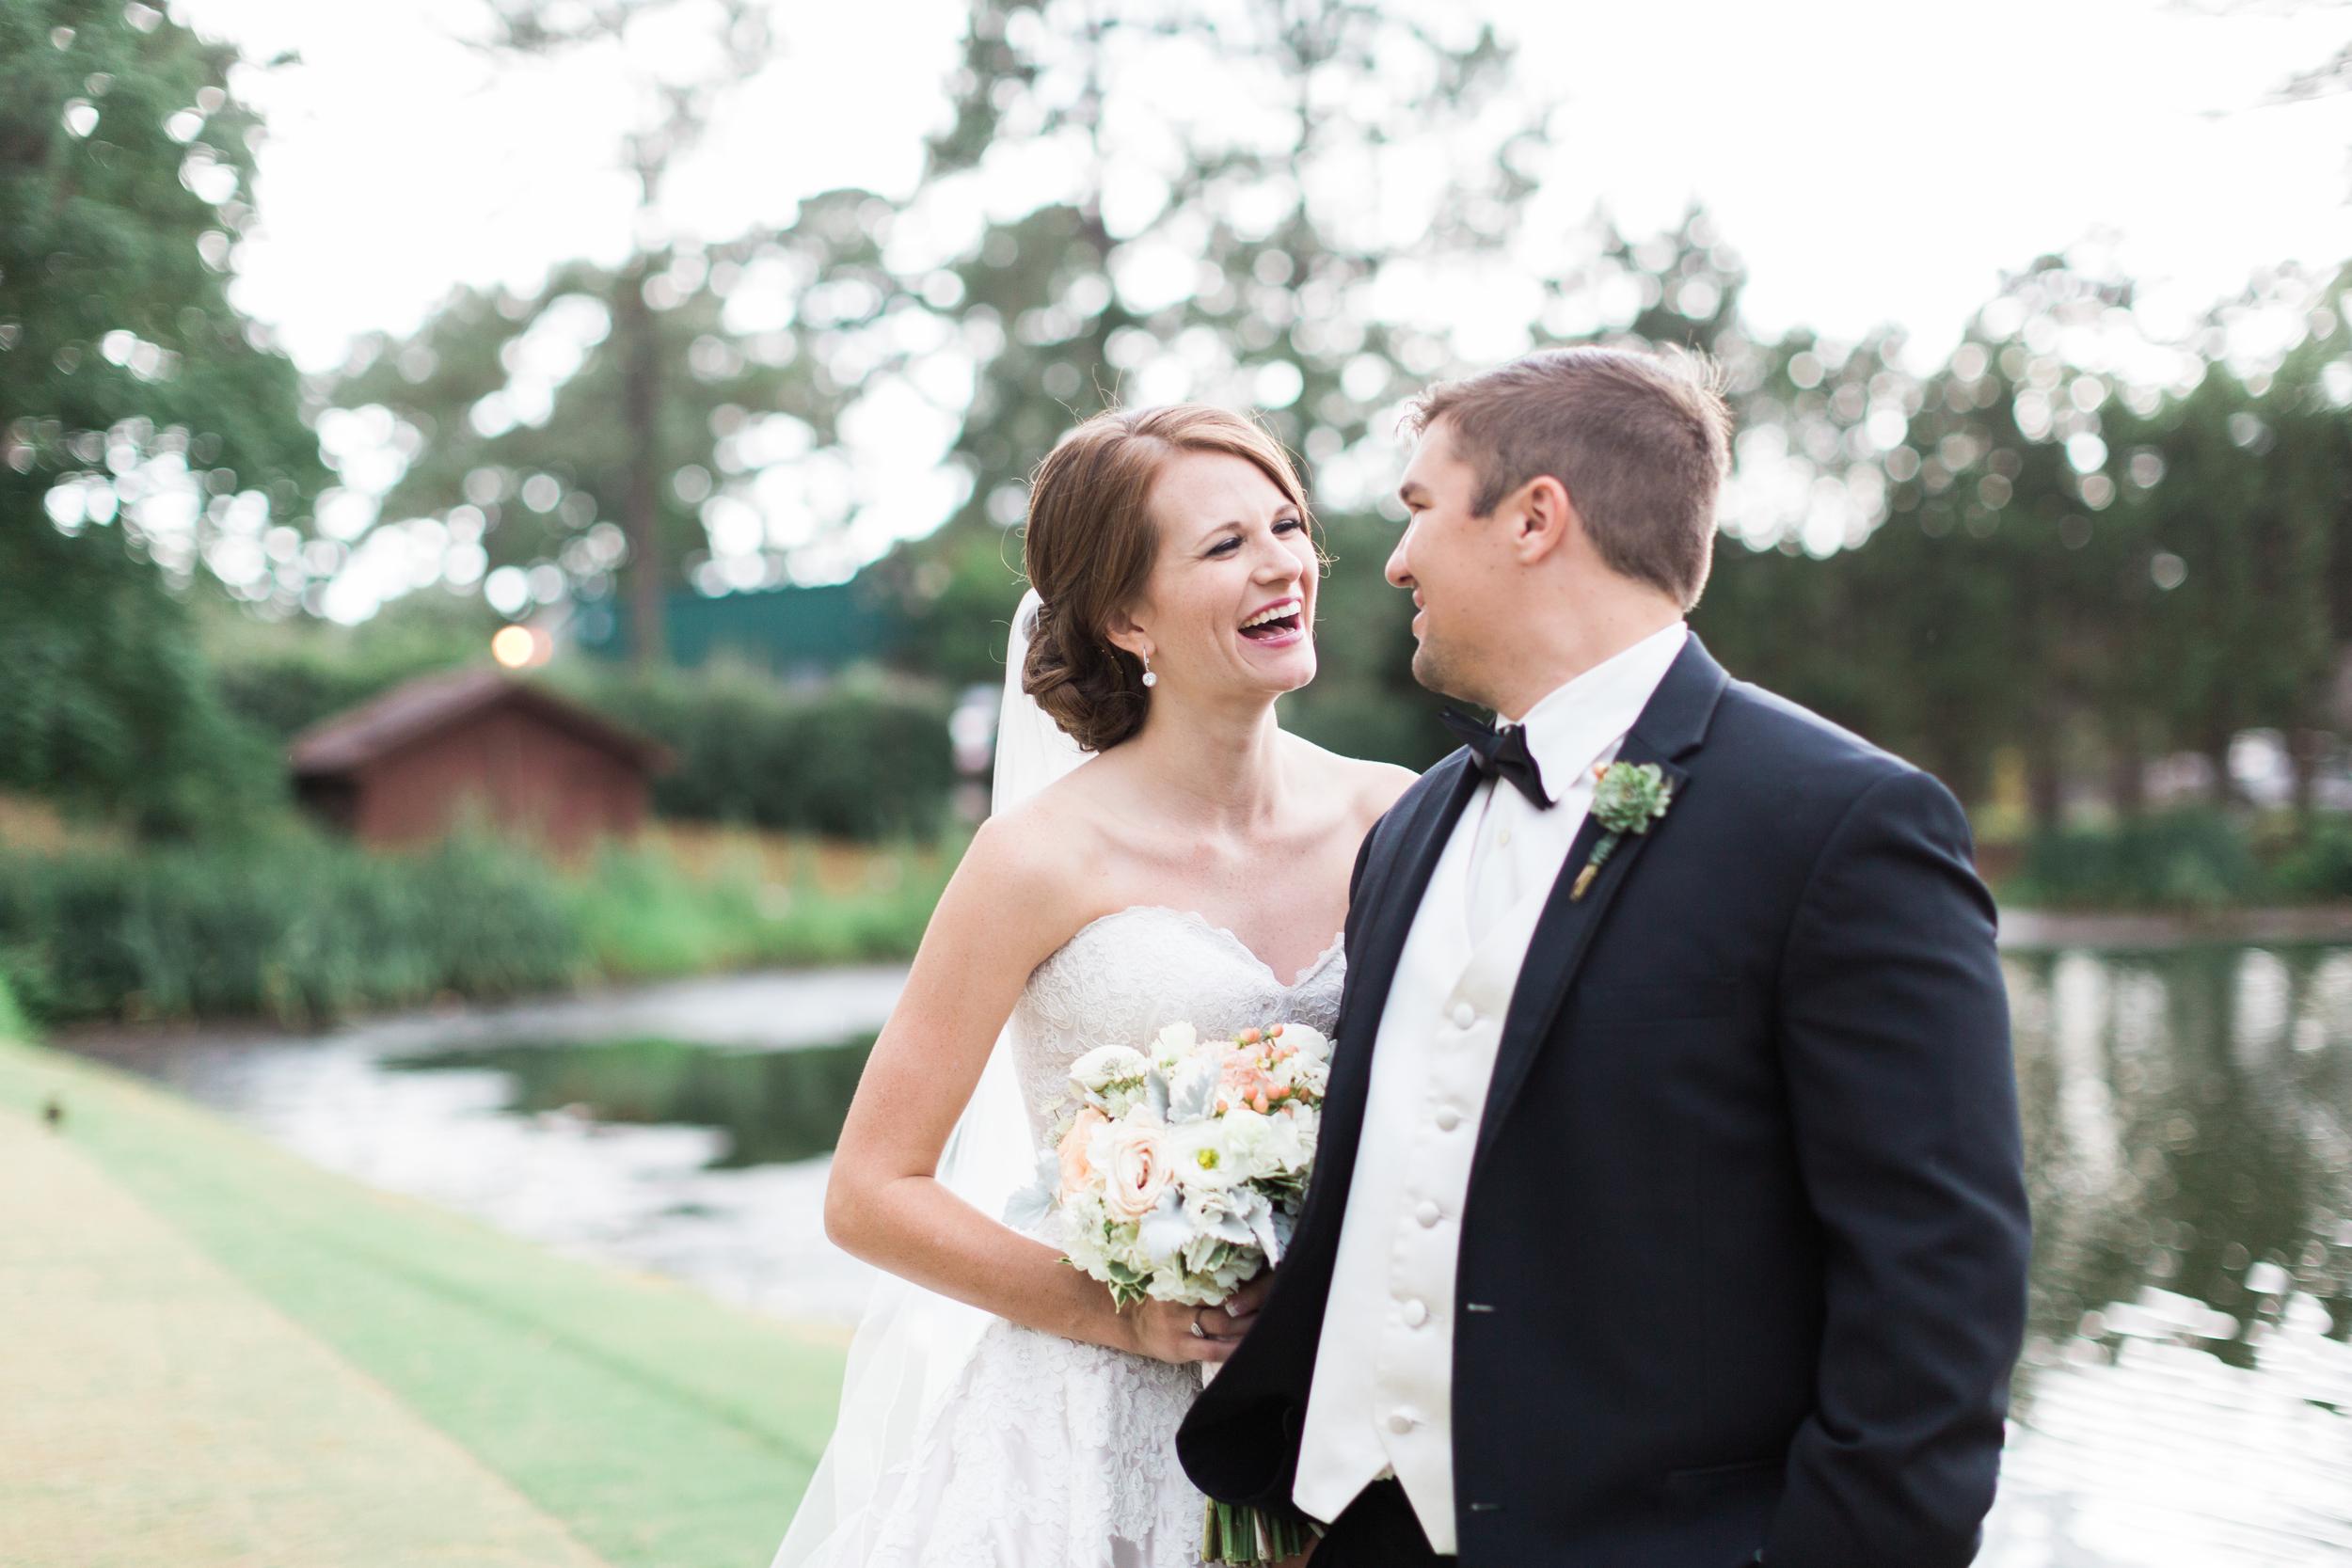 Brewbaker-Wedding-Montgomery-Alabama-Nick-Drollette-122.jpg